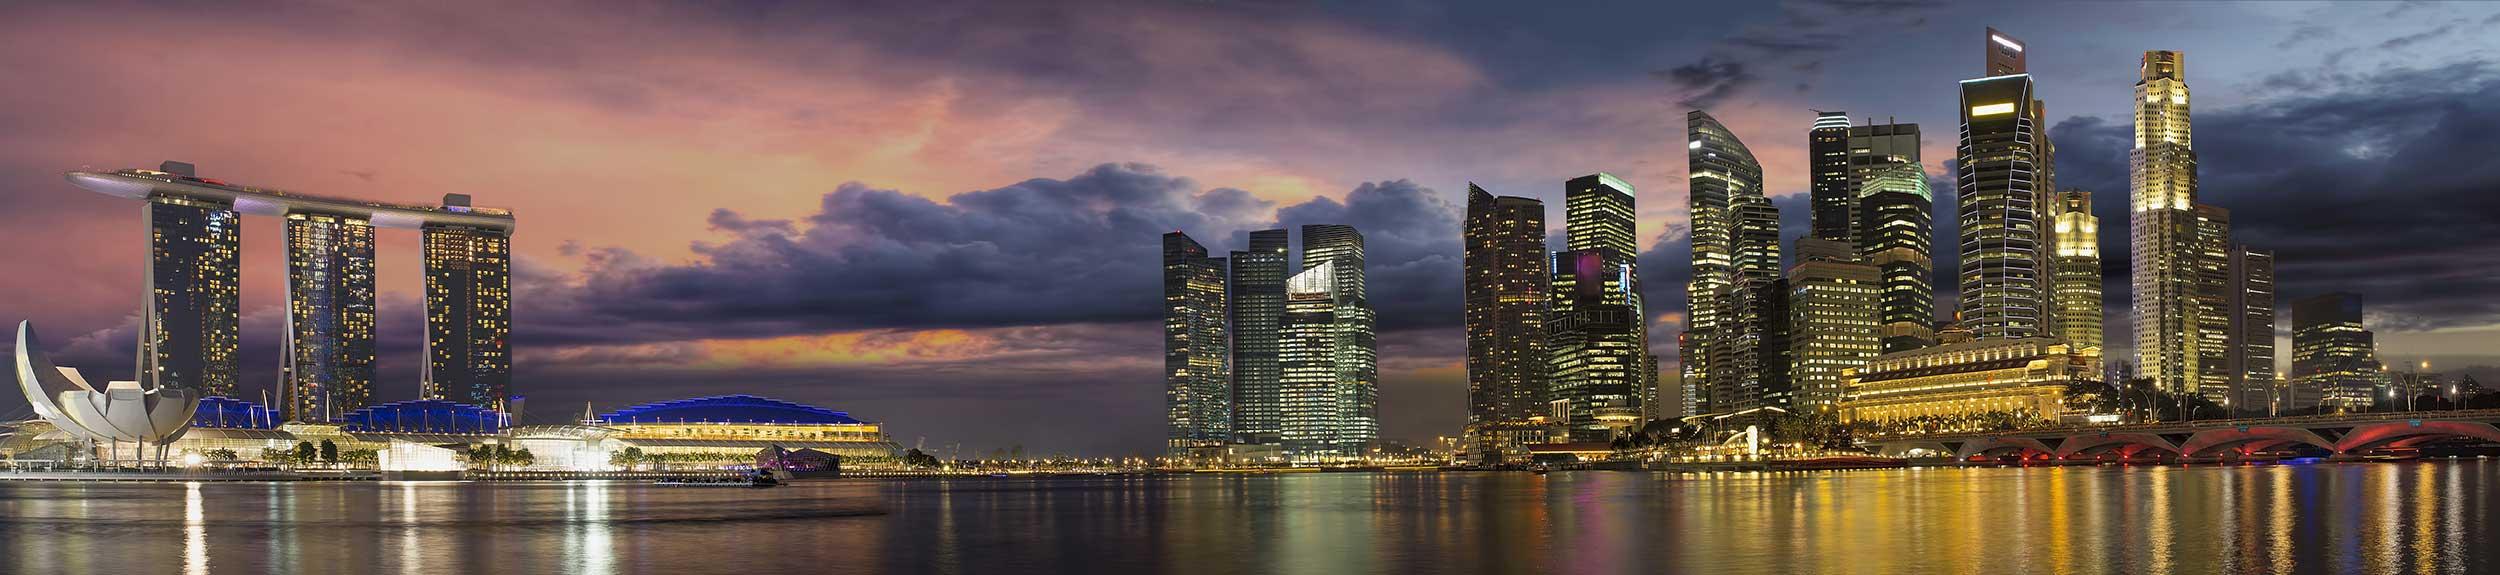 Generation-Digital-Singapore.jpg